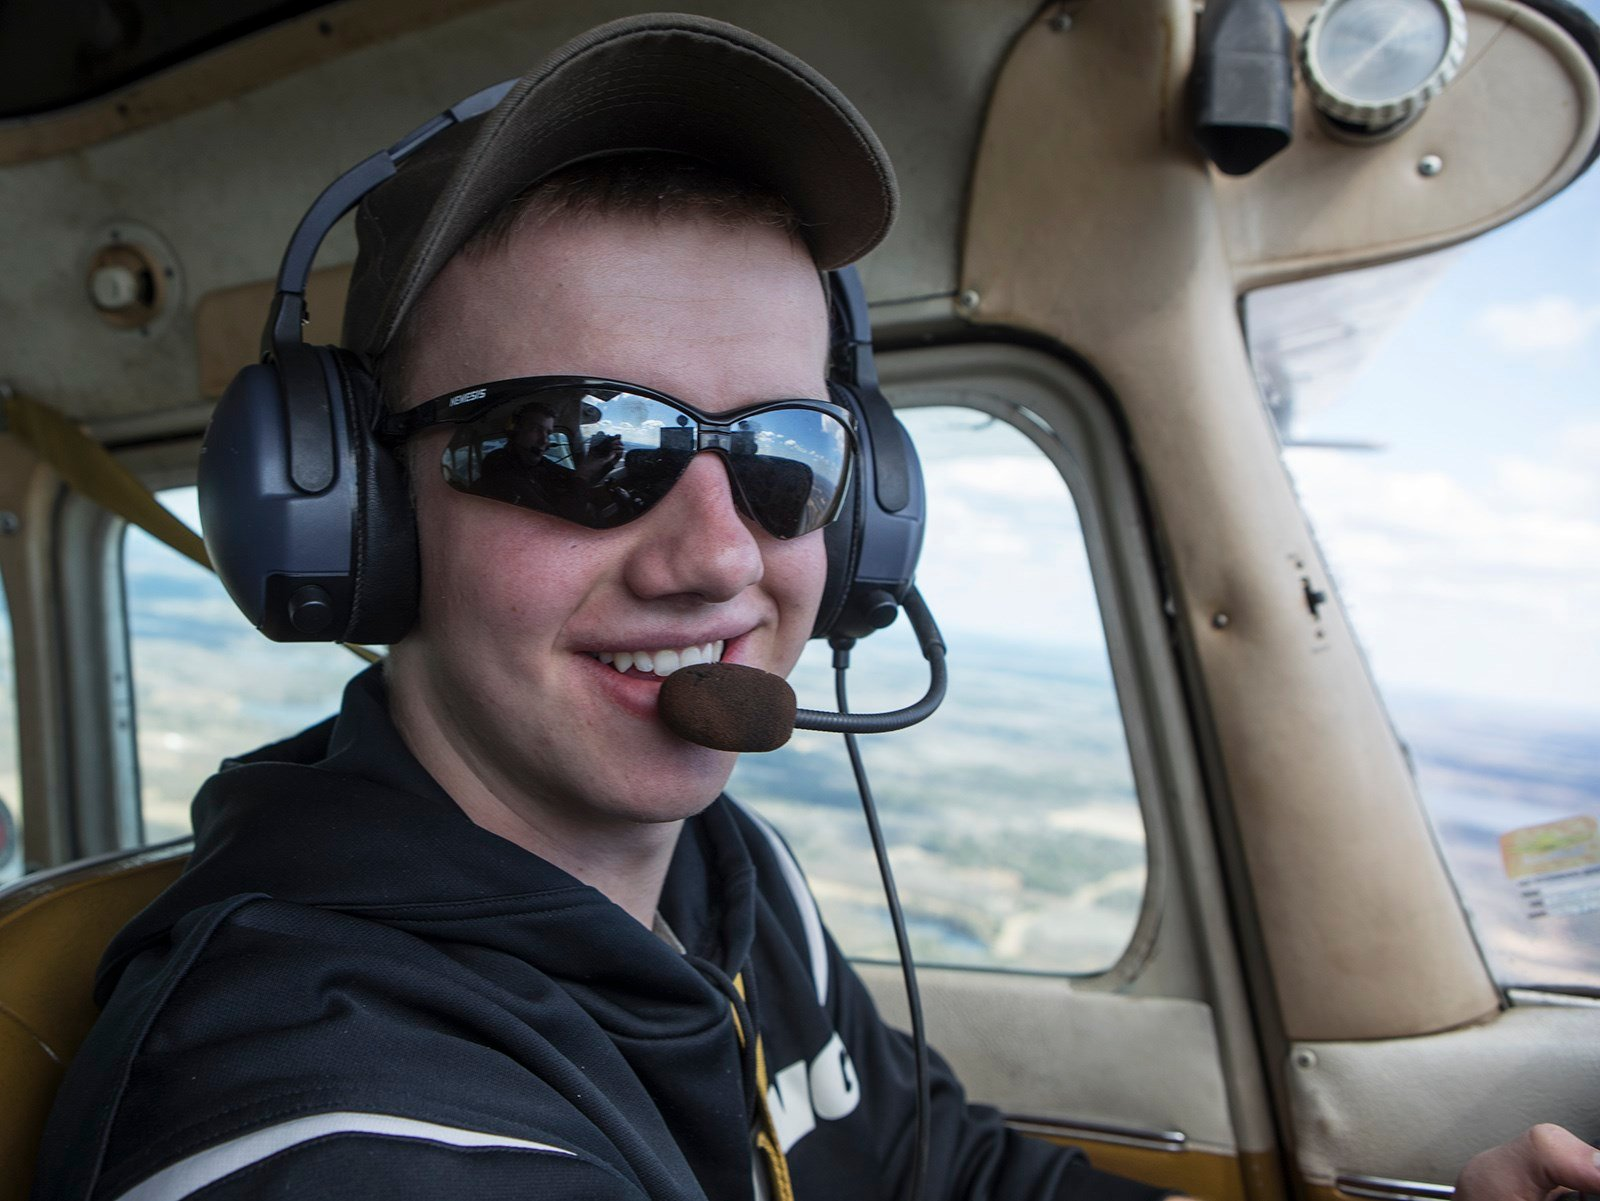 Owen Knutson flying a private plane. Courtesy: BanksPhotos.com